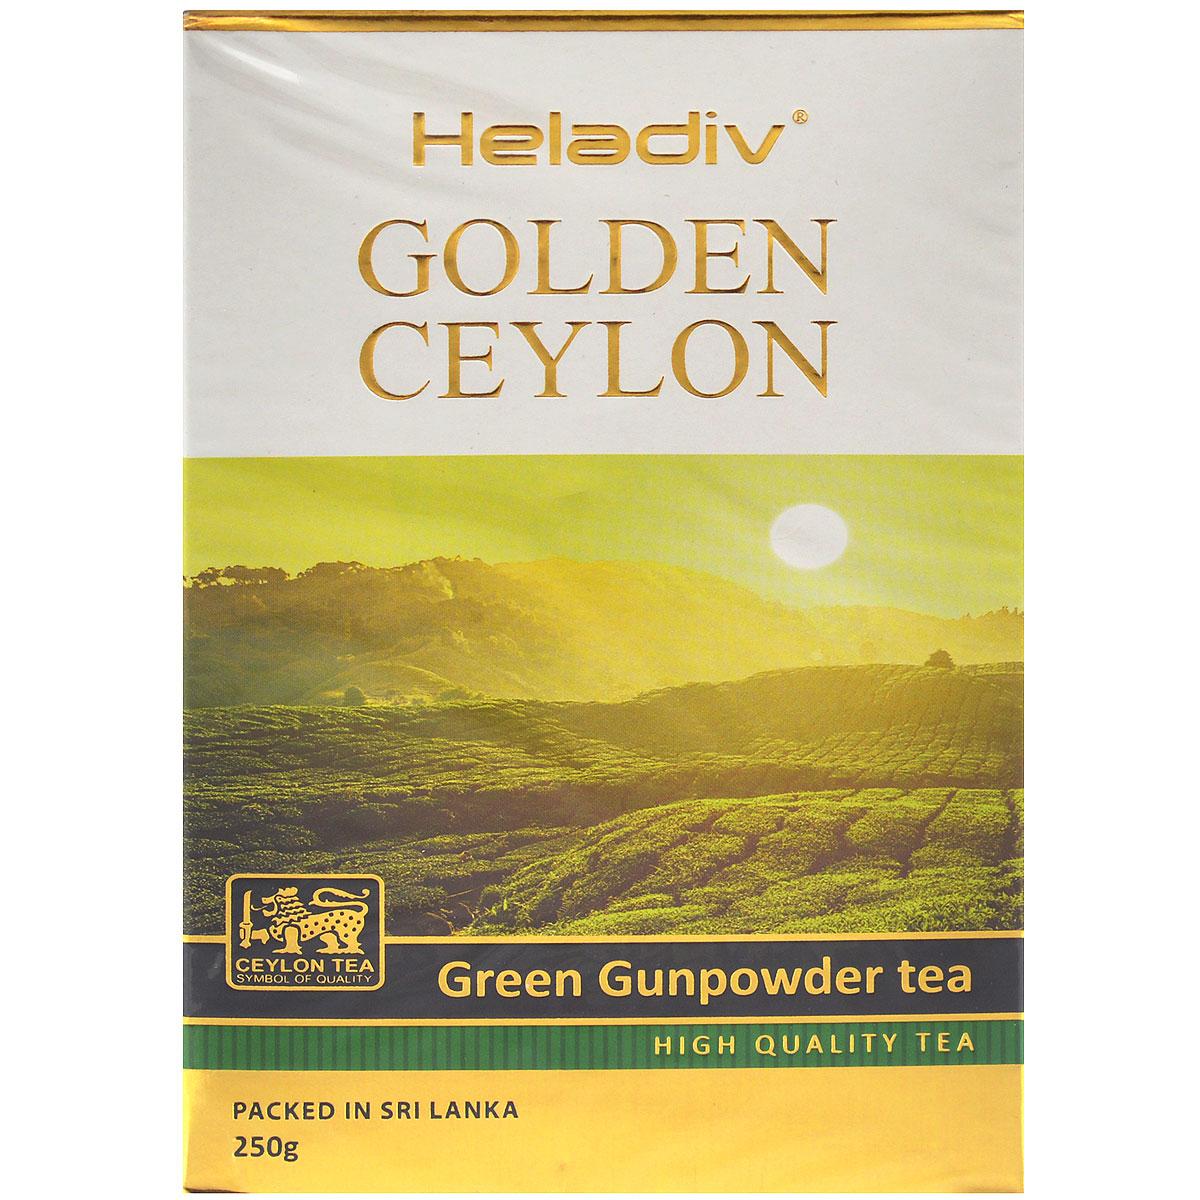 Heladiv Golden Ceylon Green Gunpowder зеленый листовой чай, 250 г чай heladiv чай черный листовой heladiv pekoe 400г